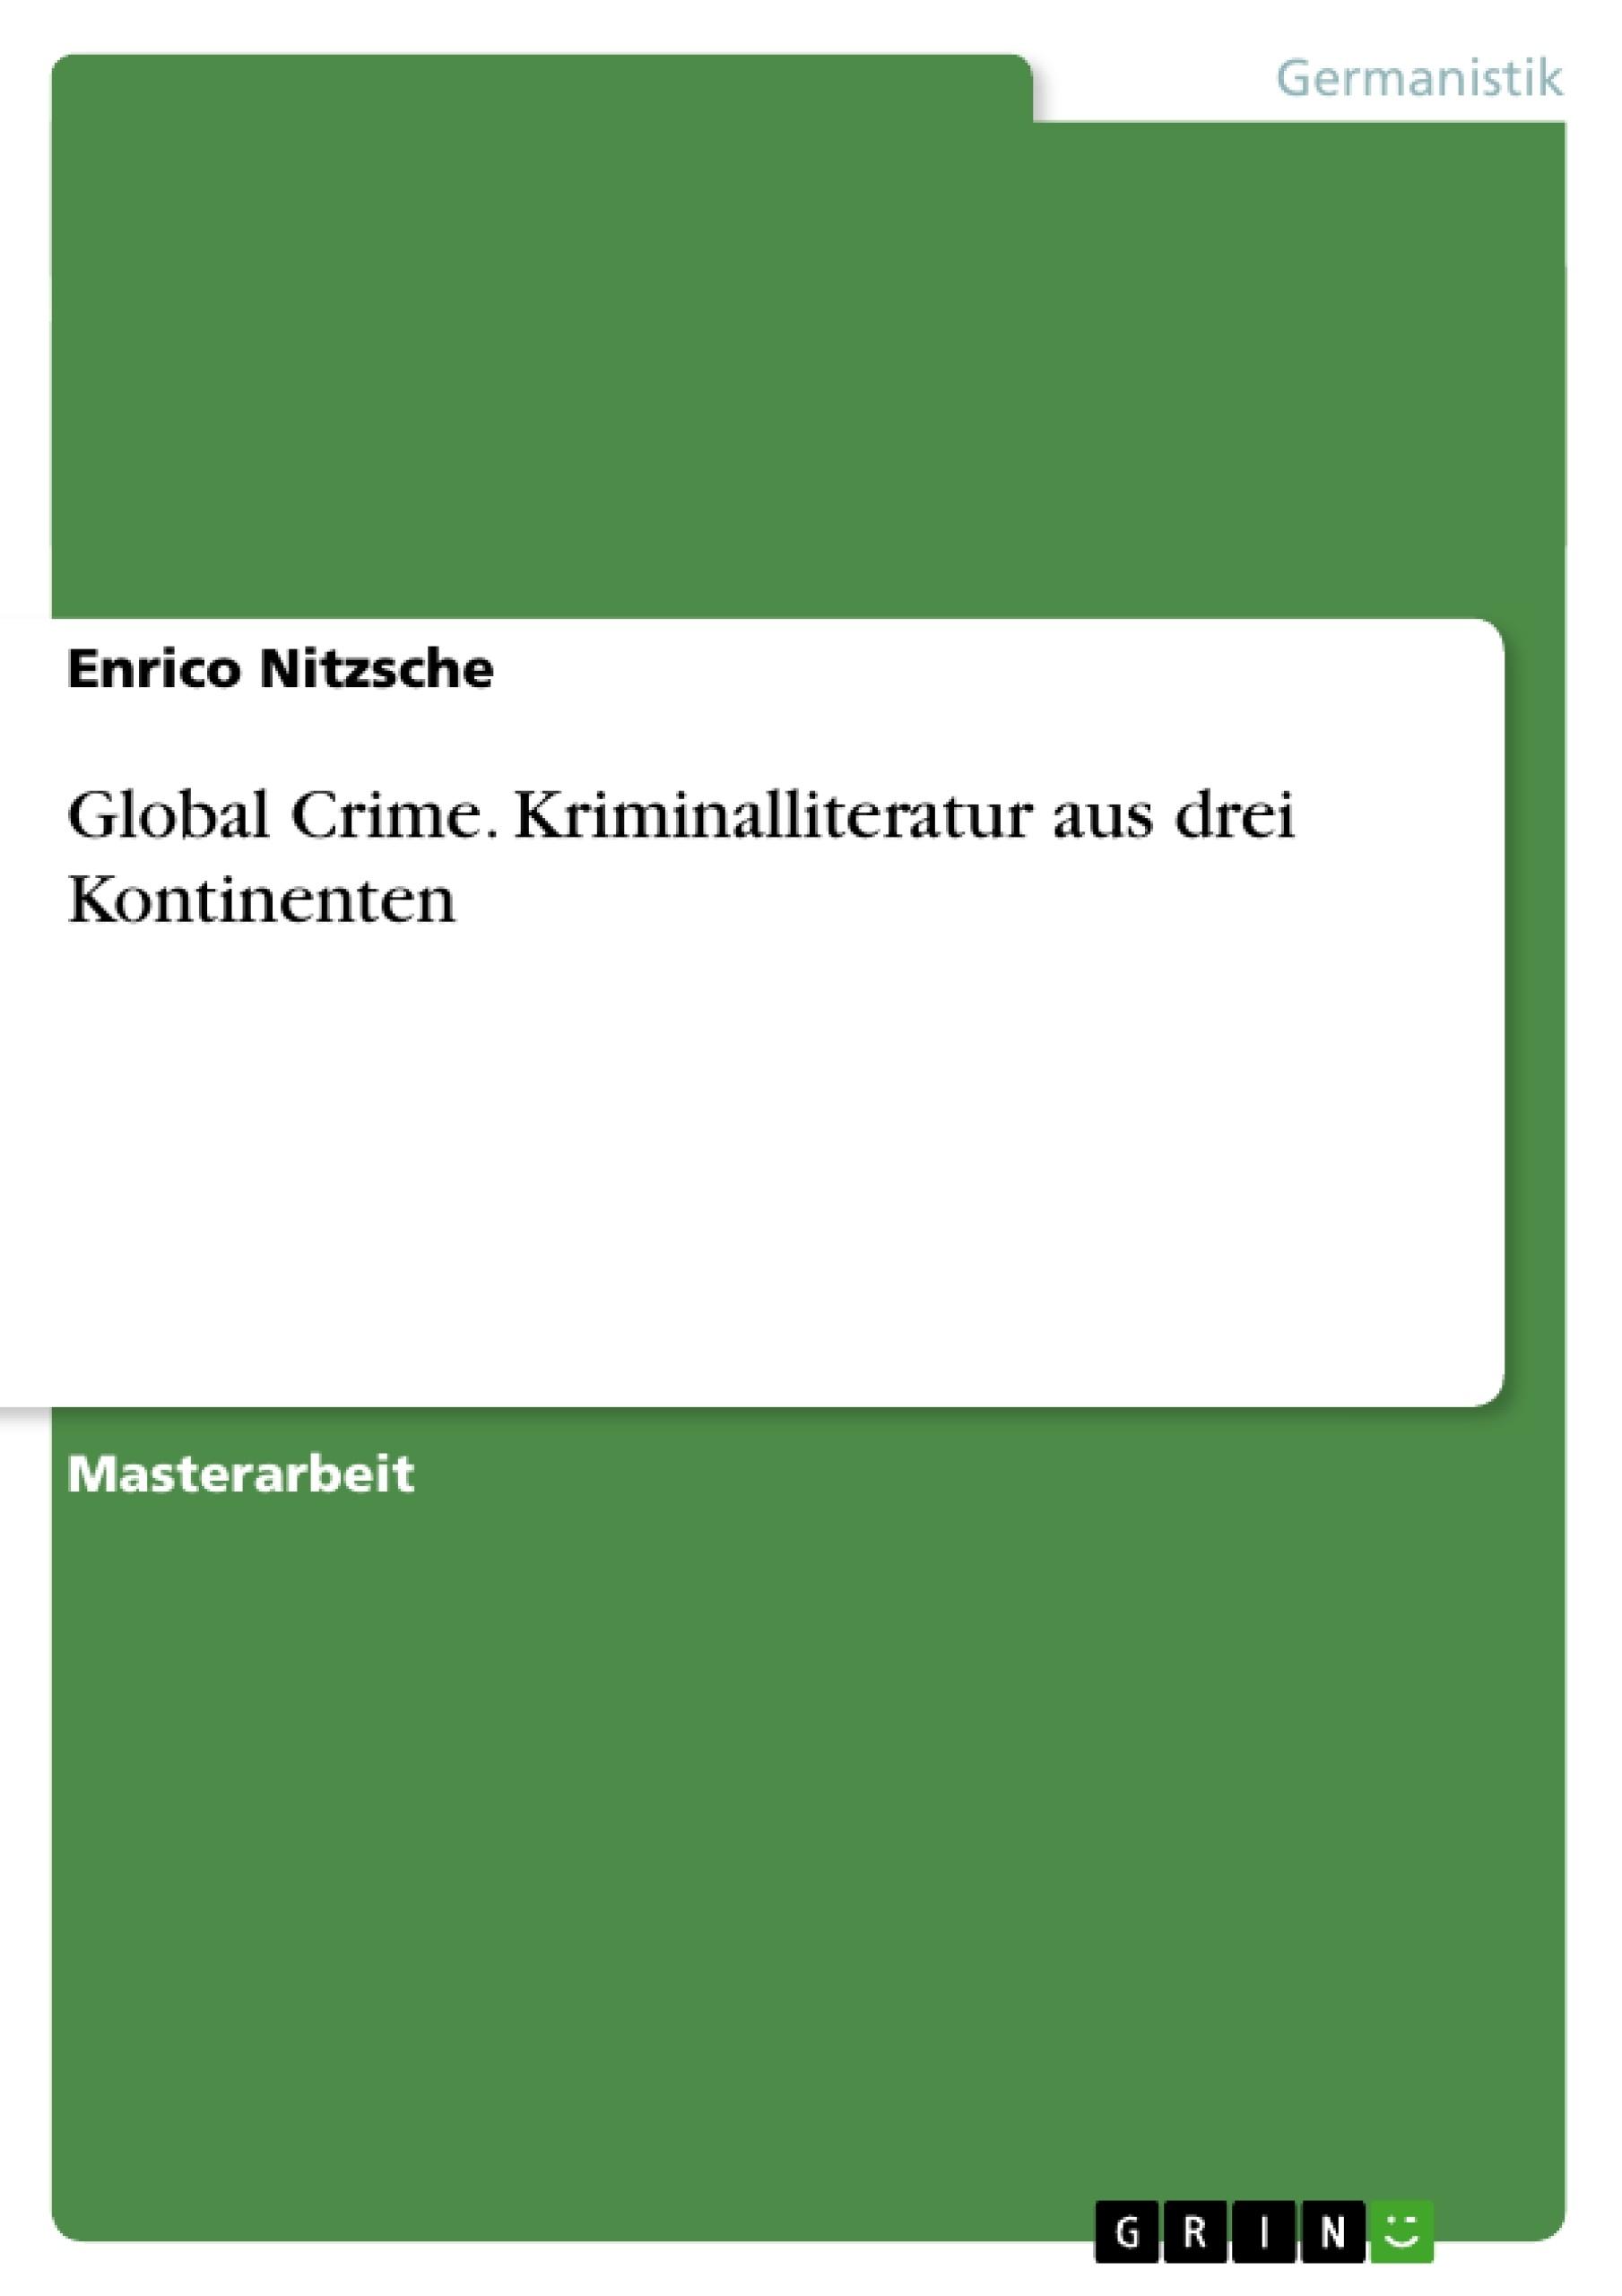 Global Crime. Kriminalliteratur aus drei Kontinenten | Masterarbeit ...